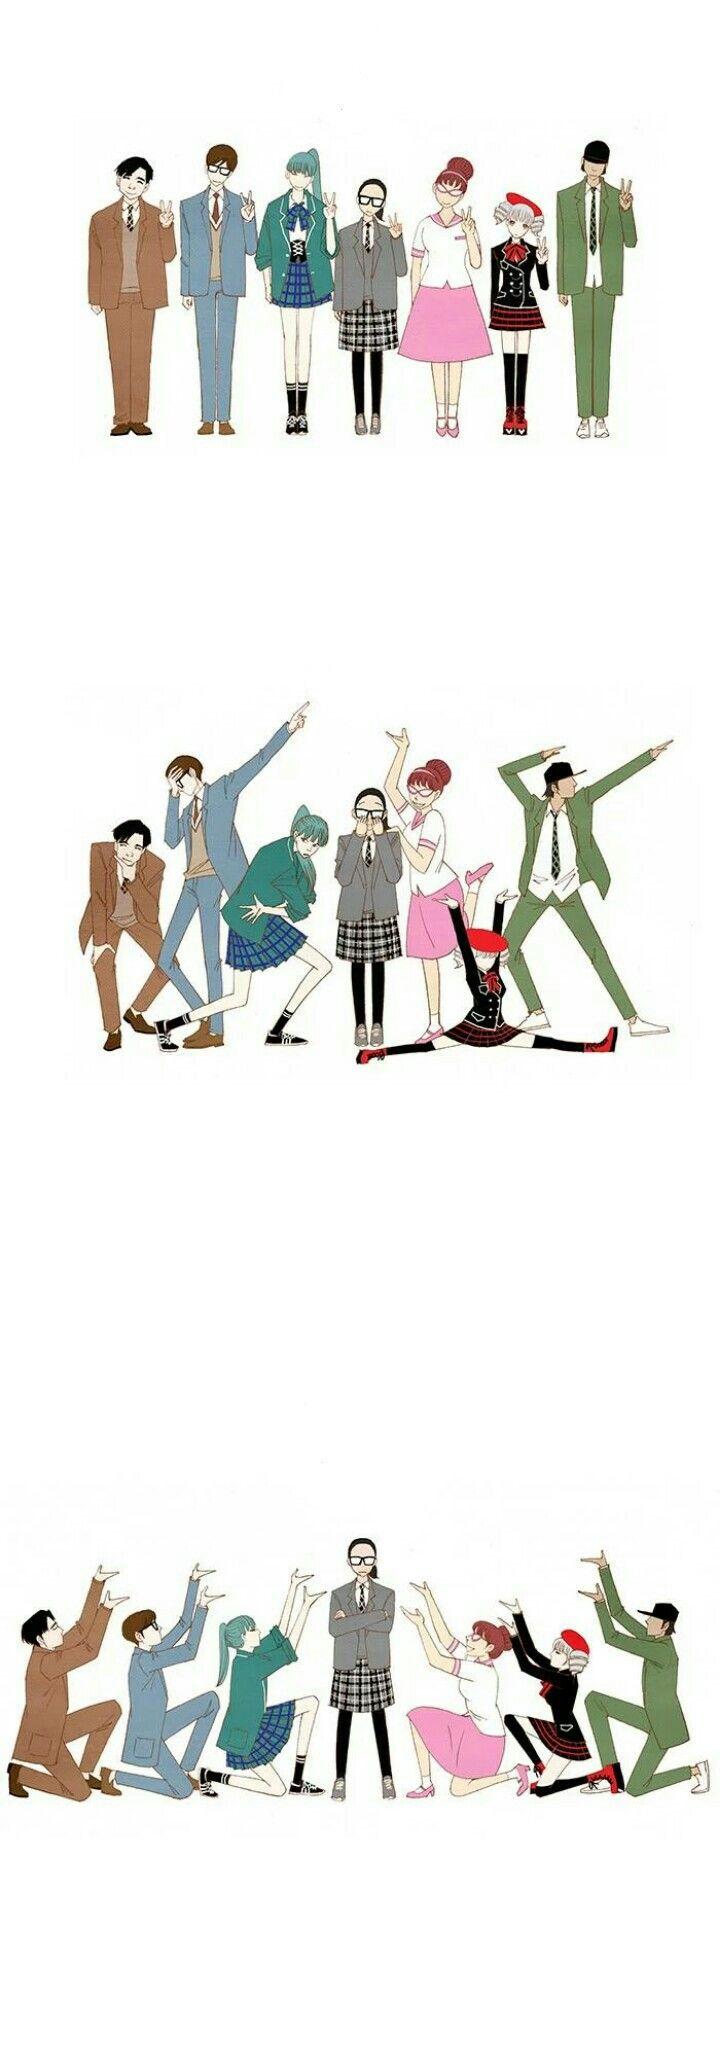 Beruntungnya wooyeon (●´∀`)ノ♡  || spirit Fingers || wooyeon song || Baebluefinger || seonho || bluefinger || mintfinger || pinkfinger || brownfinger || blackfinger || khakifinger || redfinger || komik webtoon line